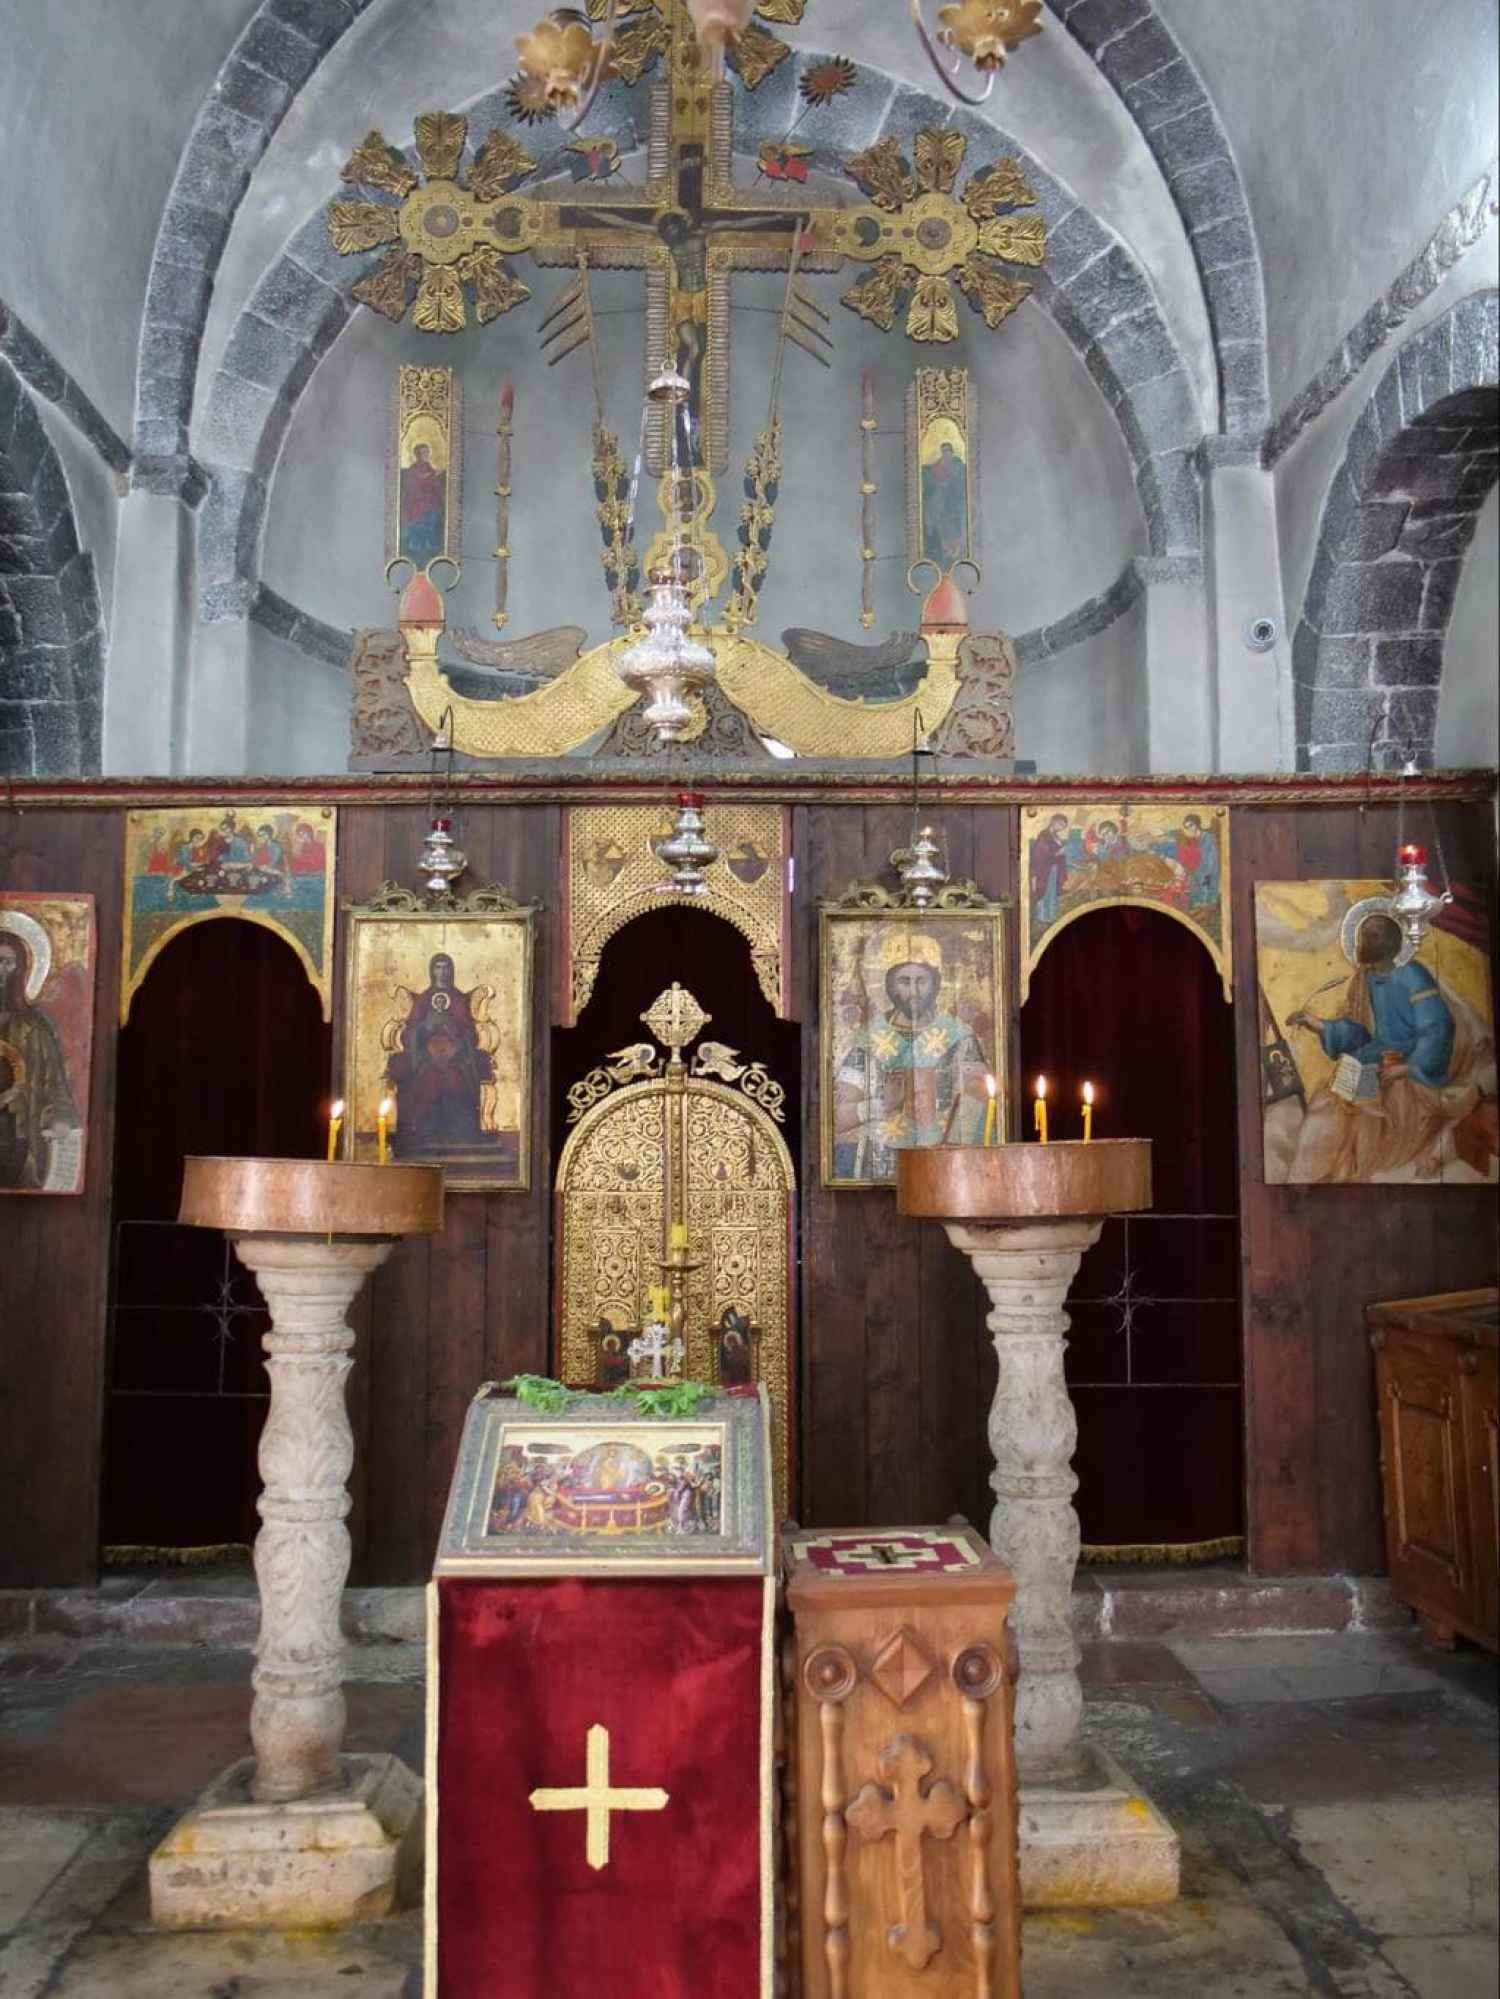 St. Luke's Church interior